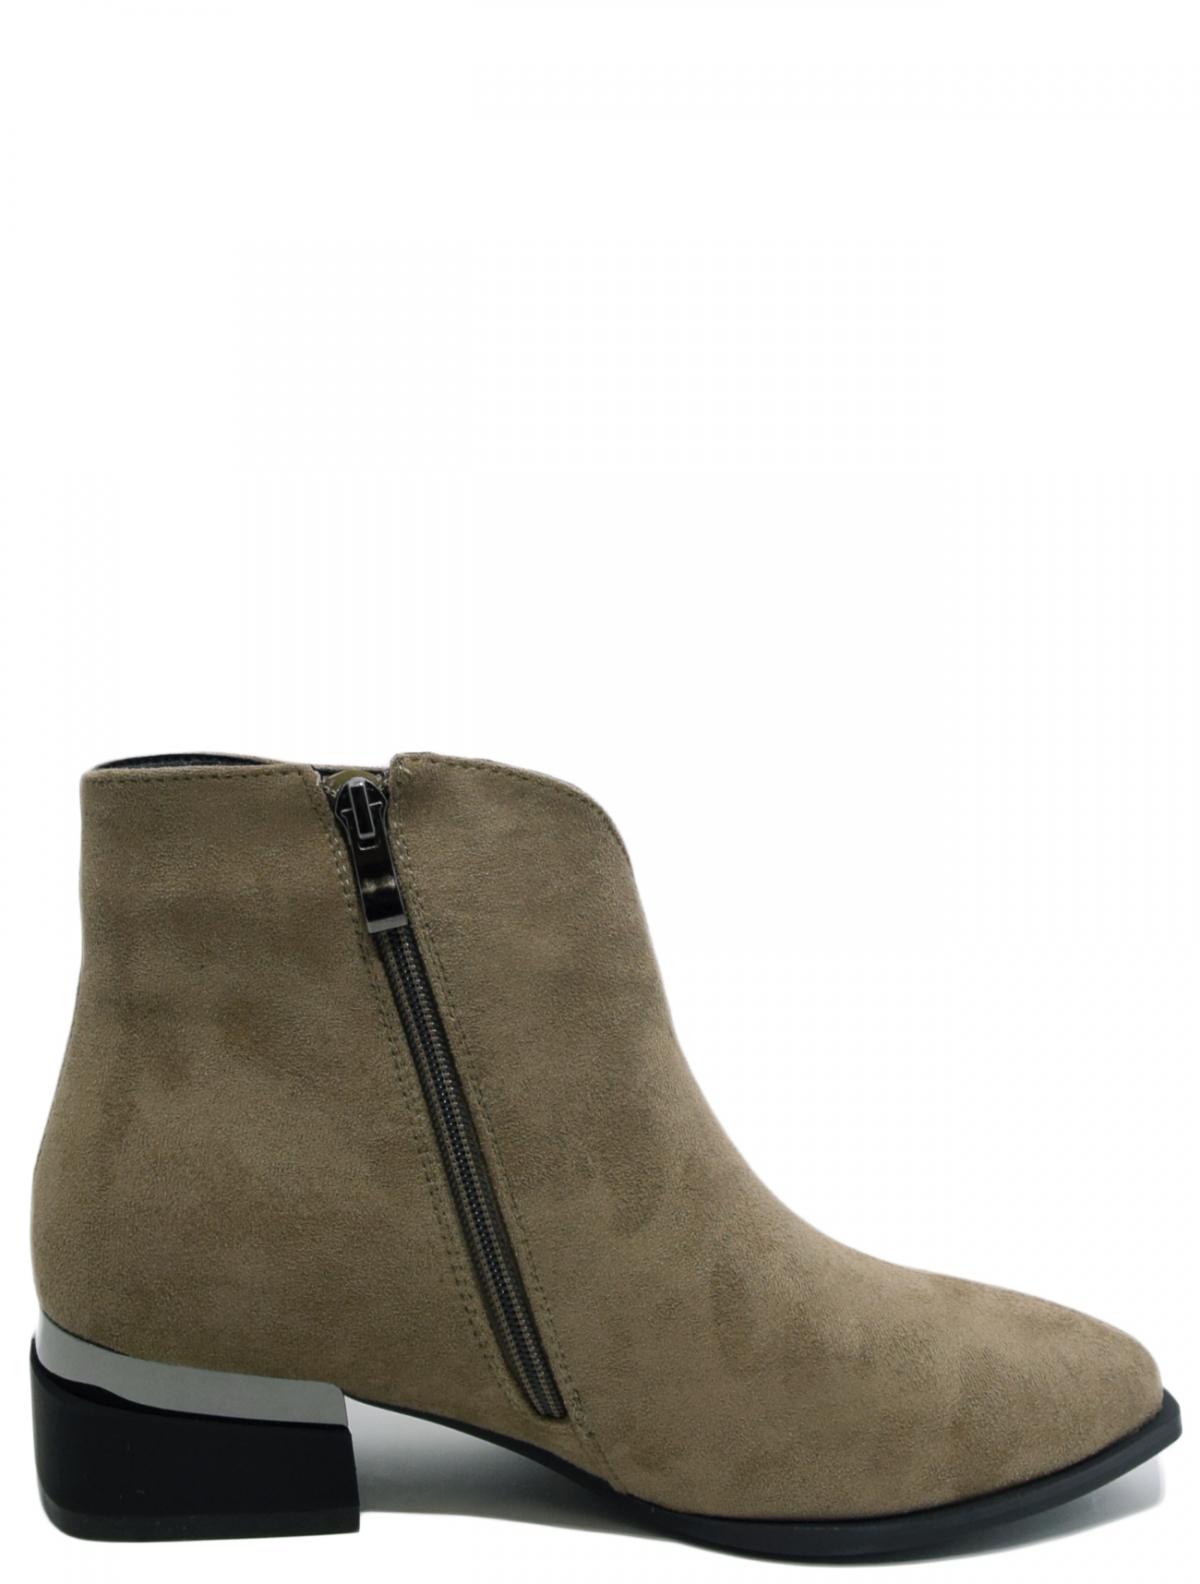 Admlis 5332-1 женские ботинки